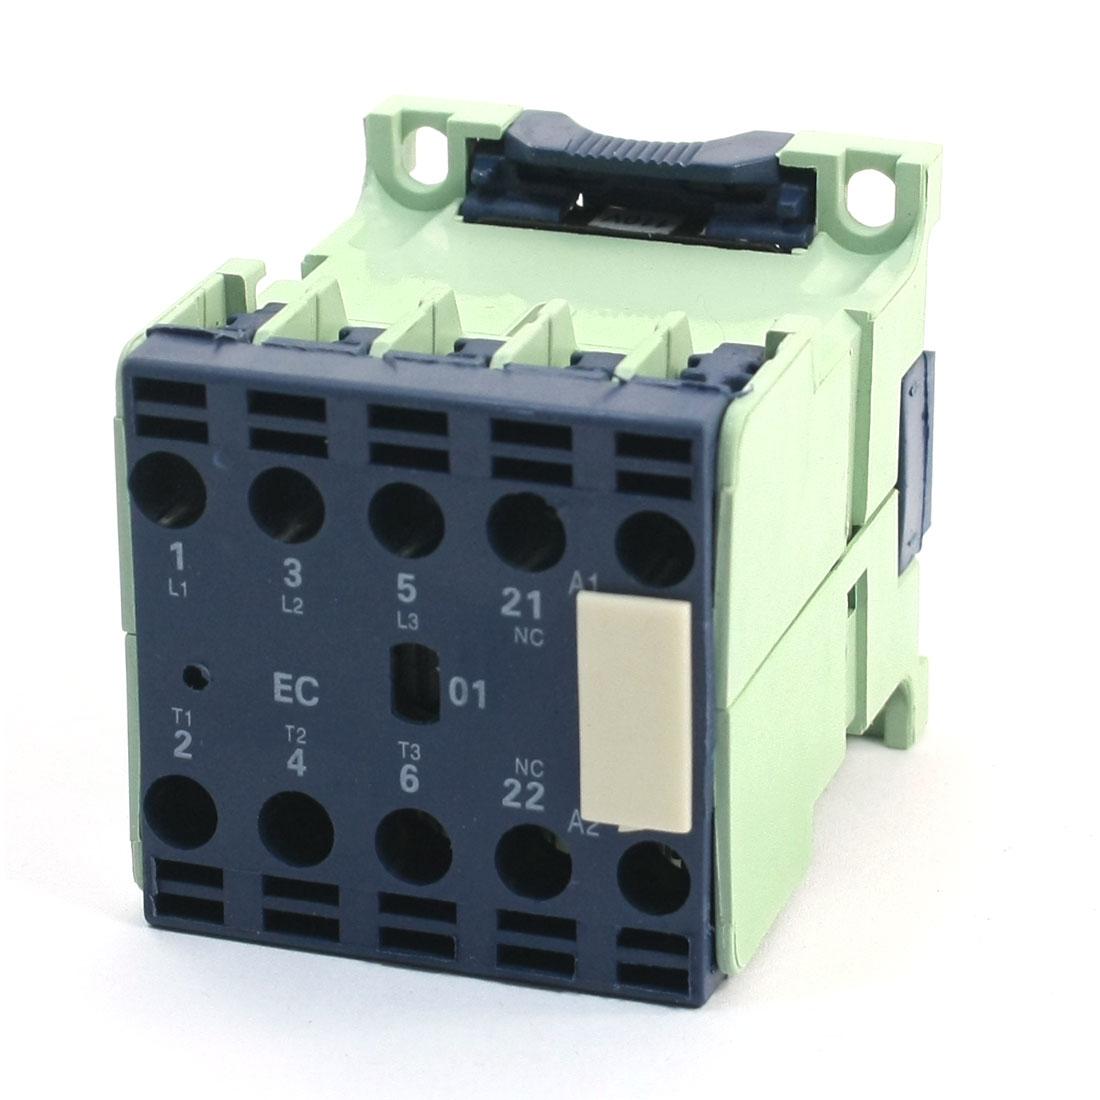 CJX2-1201E 12Amp 3 Poles 3P 1NC DIN Rail AC Contactor 110V Coil